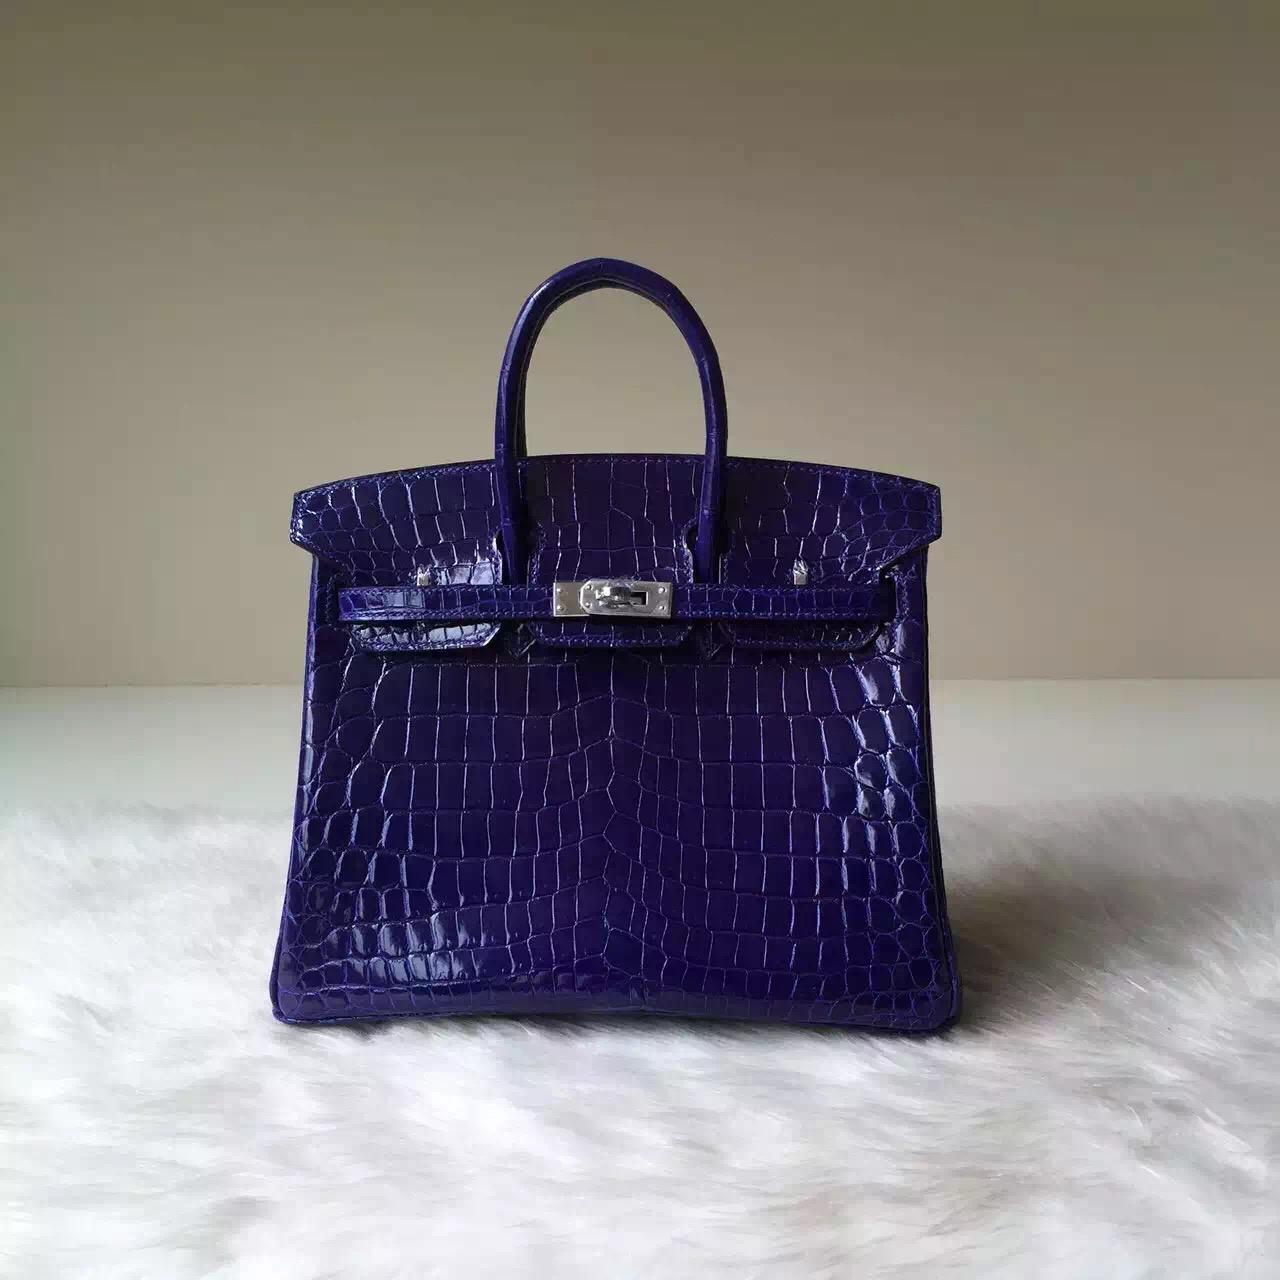 Hermes Bag Website 7T Blue Electric Crocodile Shiny Leather Birkin 25cm